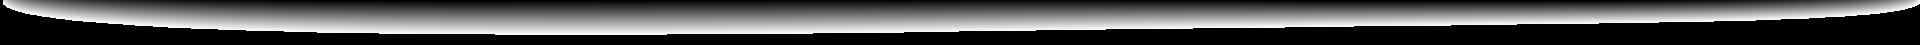 text divider line